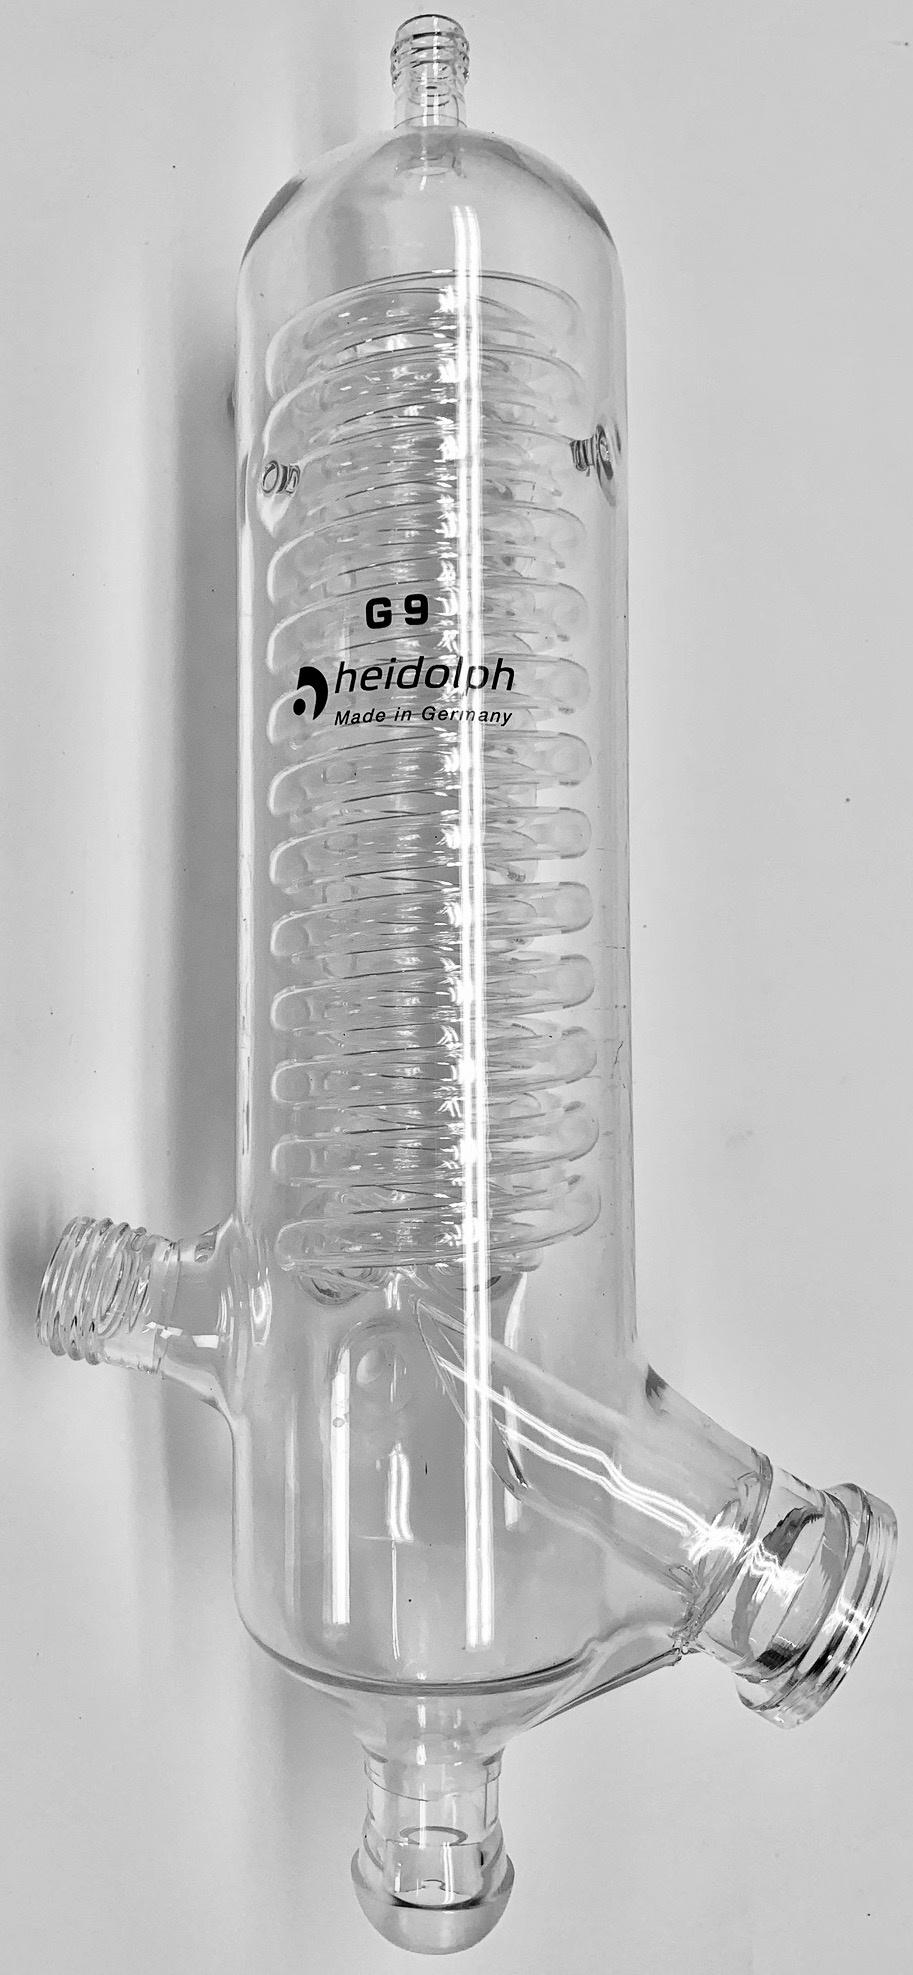 Heidolph Heidolph G9B Diagonalkühler